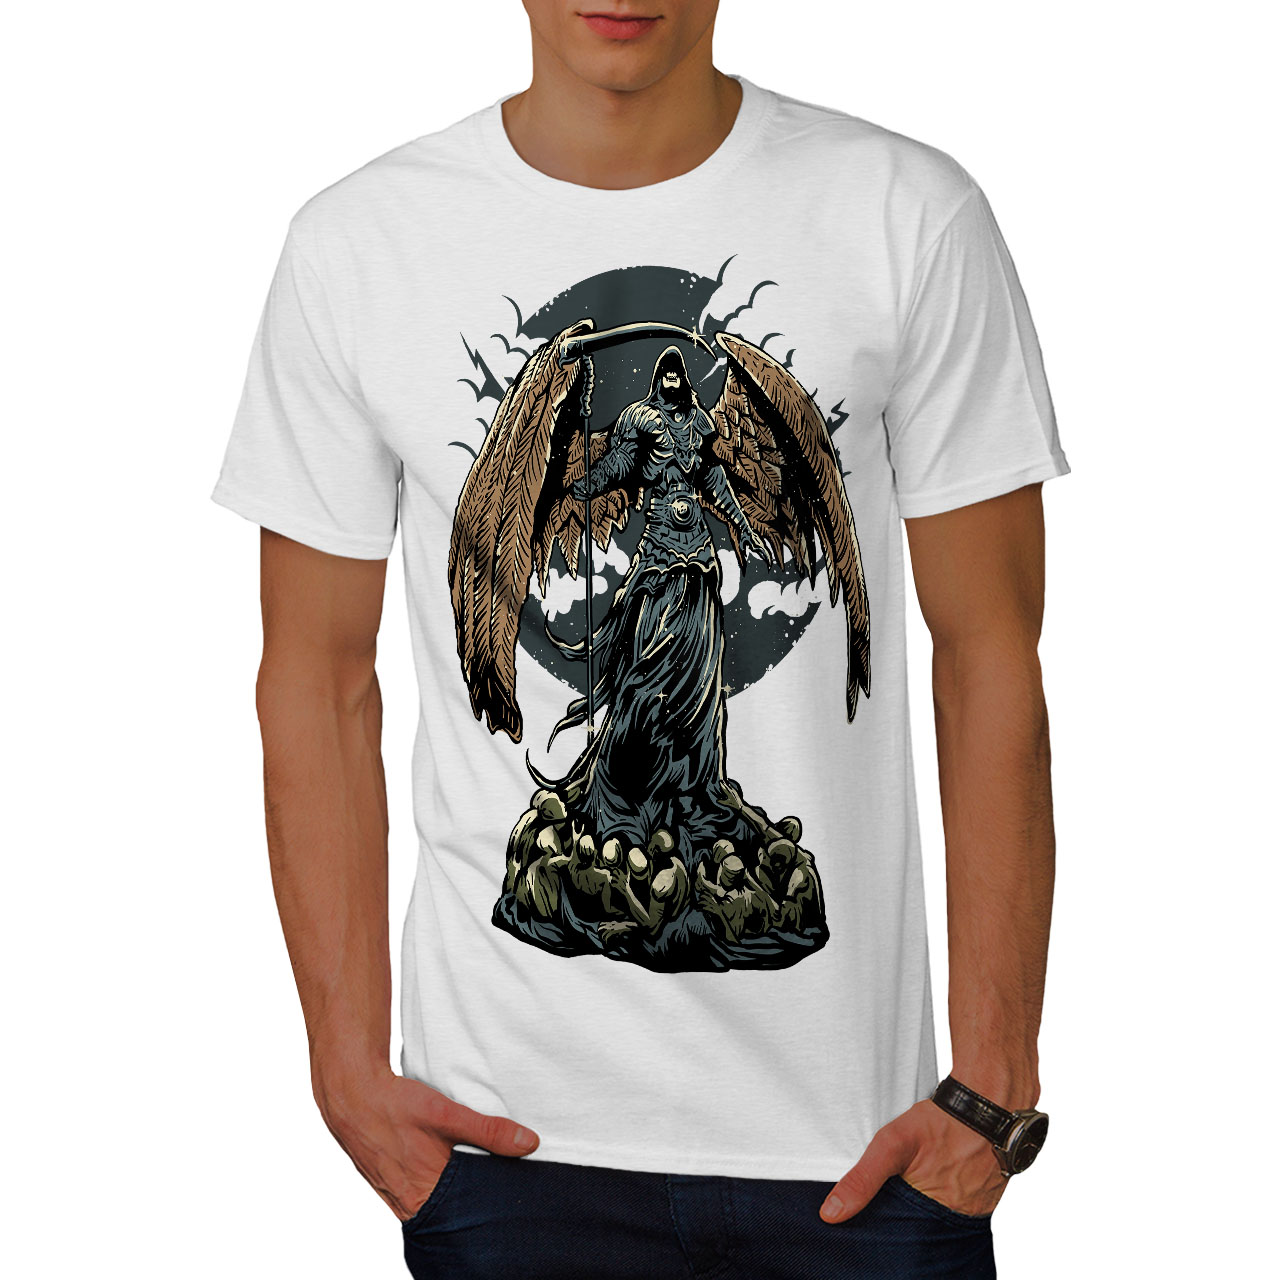 Wellcoda-Evil-Grim-Reaper-Mens-T-shirt-Horror-Graphic-Design-Printed-Tee thumbnail 9